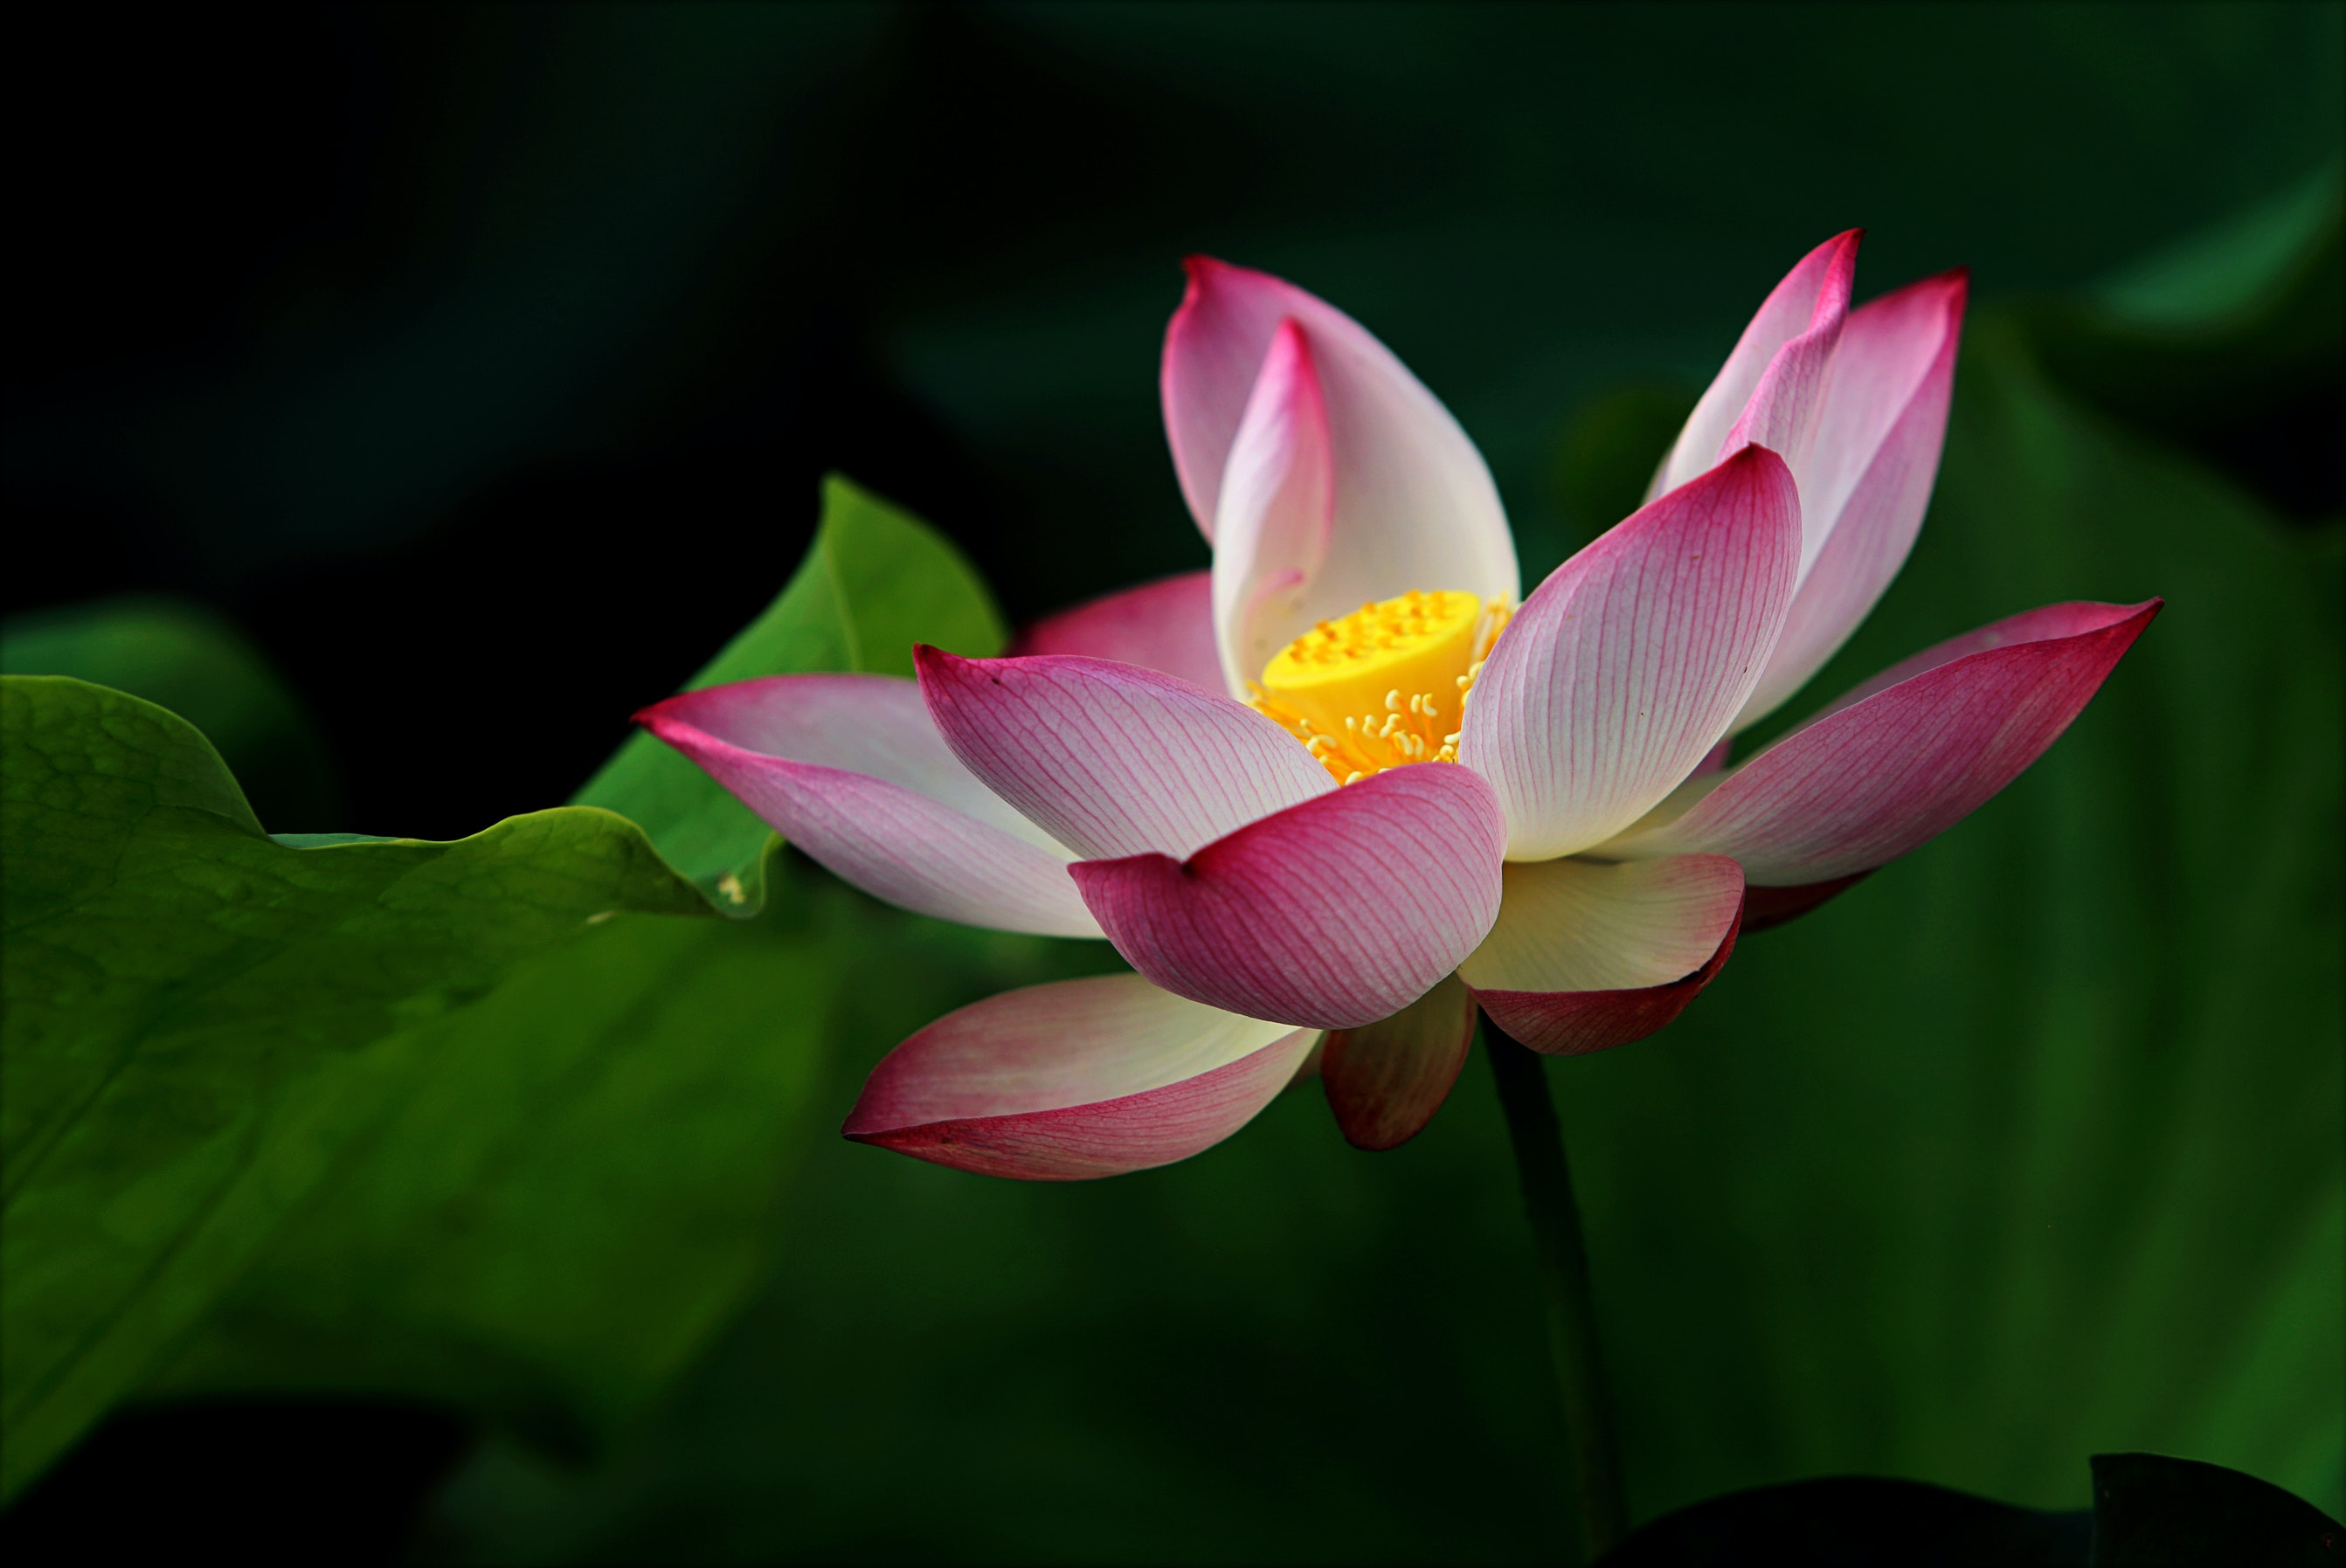 43 relaxing lotus images pexels free stock photos fetching more photos izmirmasajfo